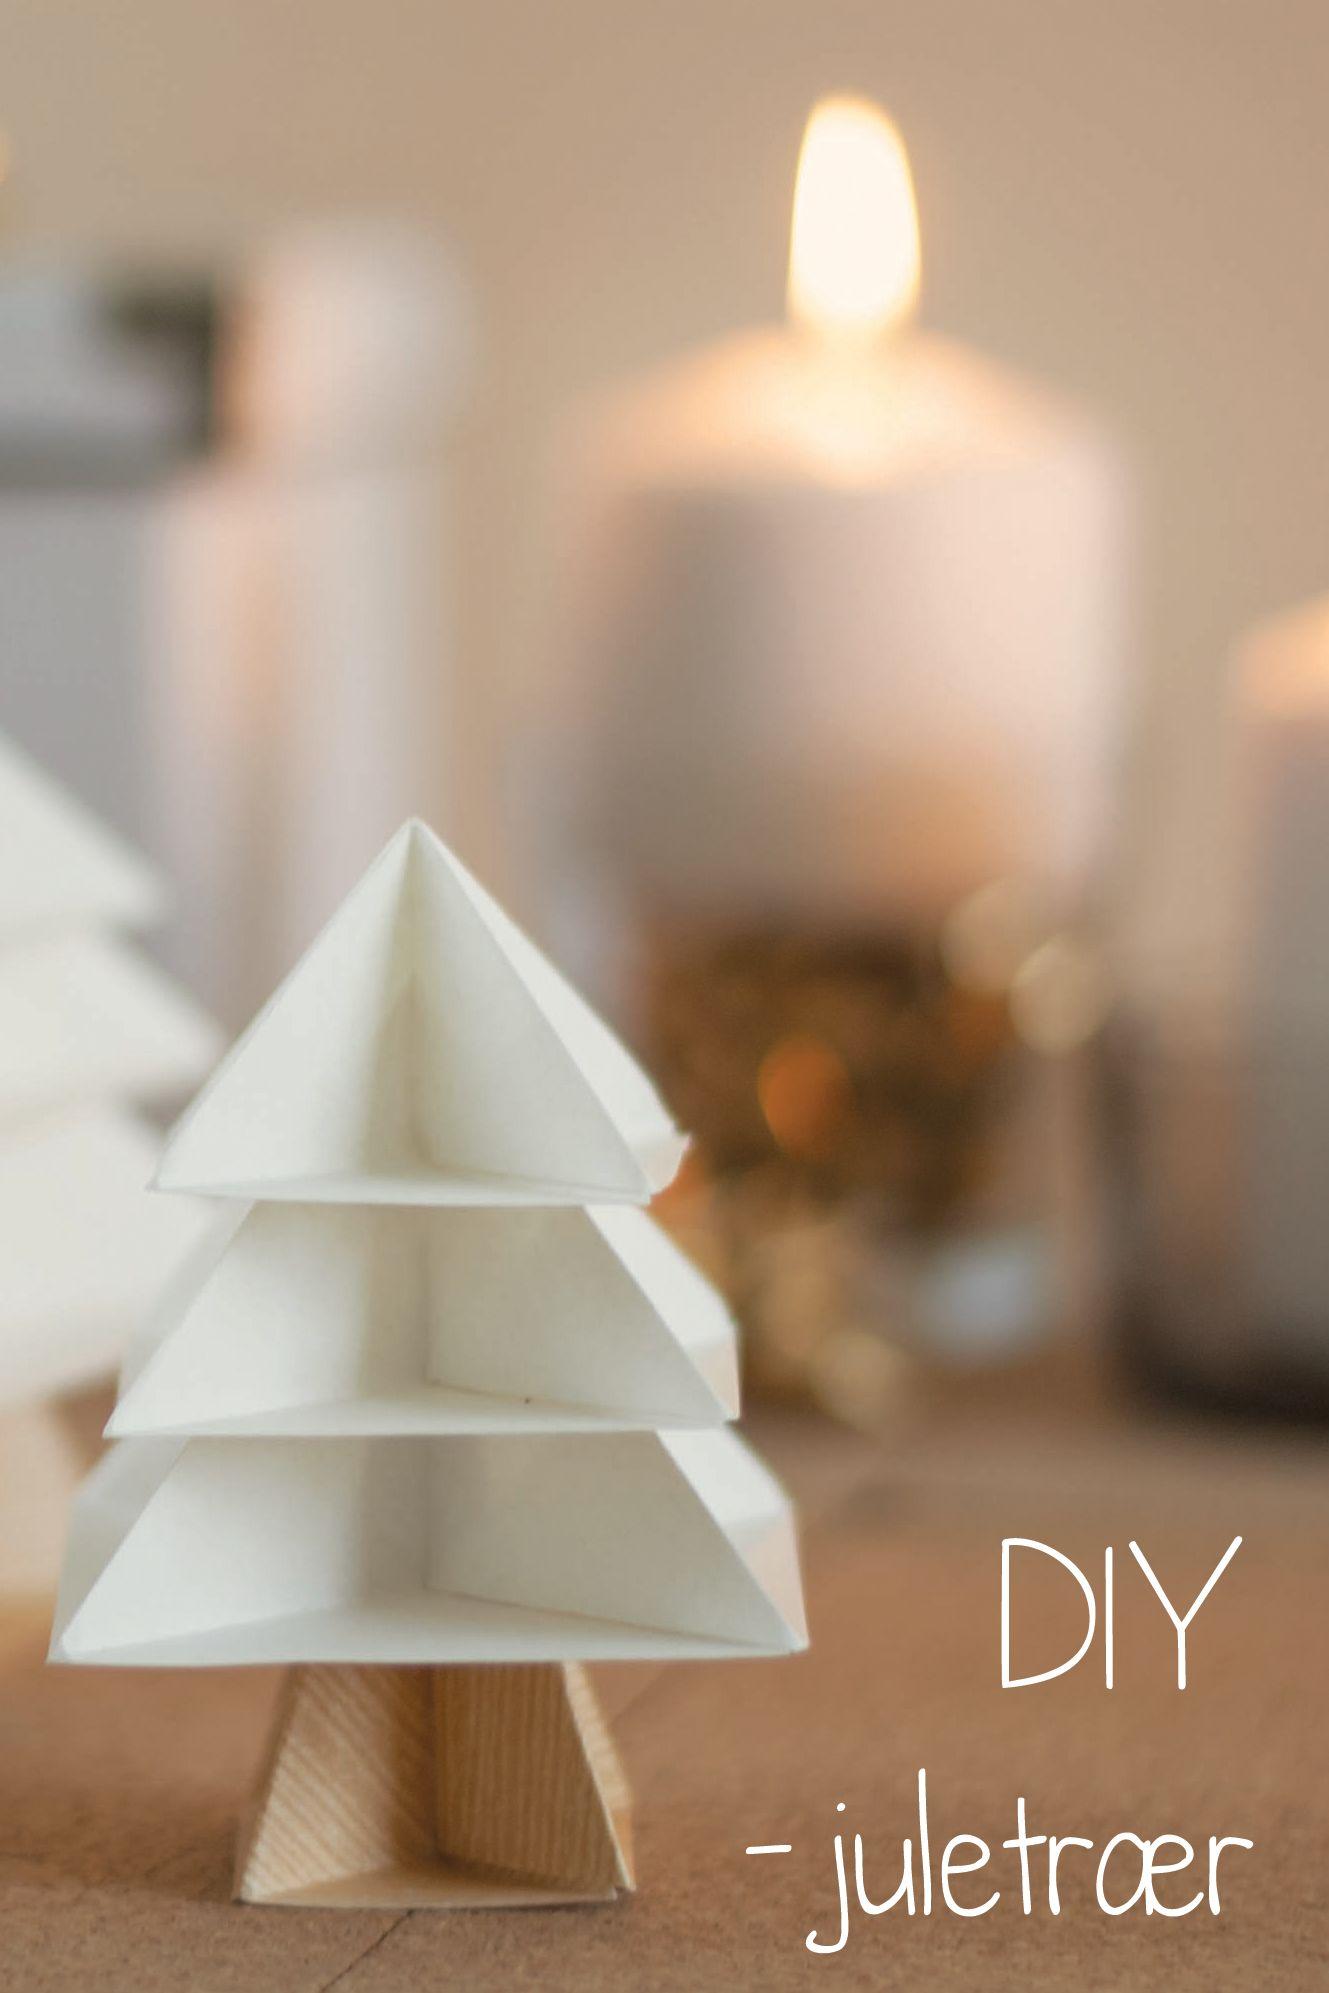 Little diy paper tree mis próximos proyectos pinterest diy